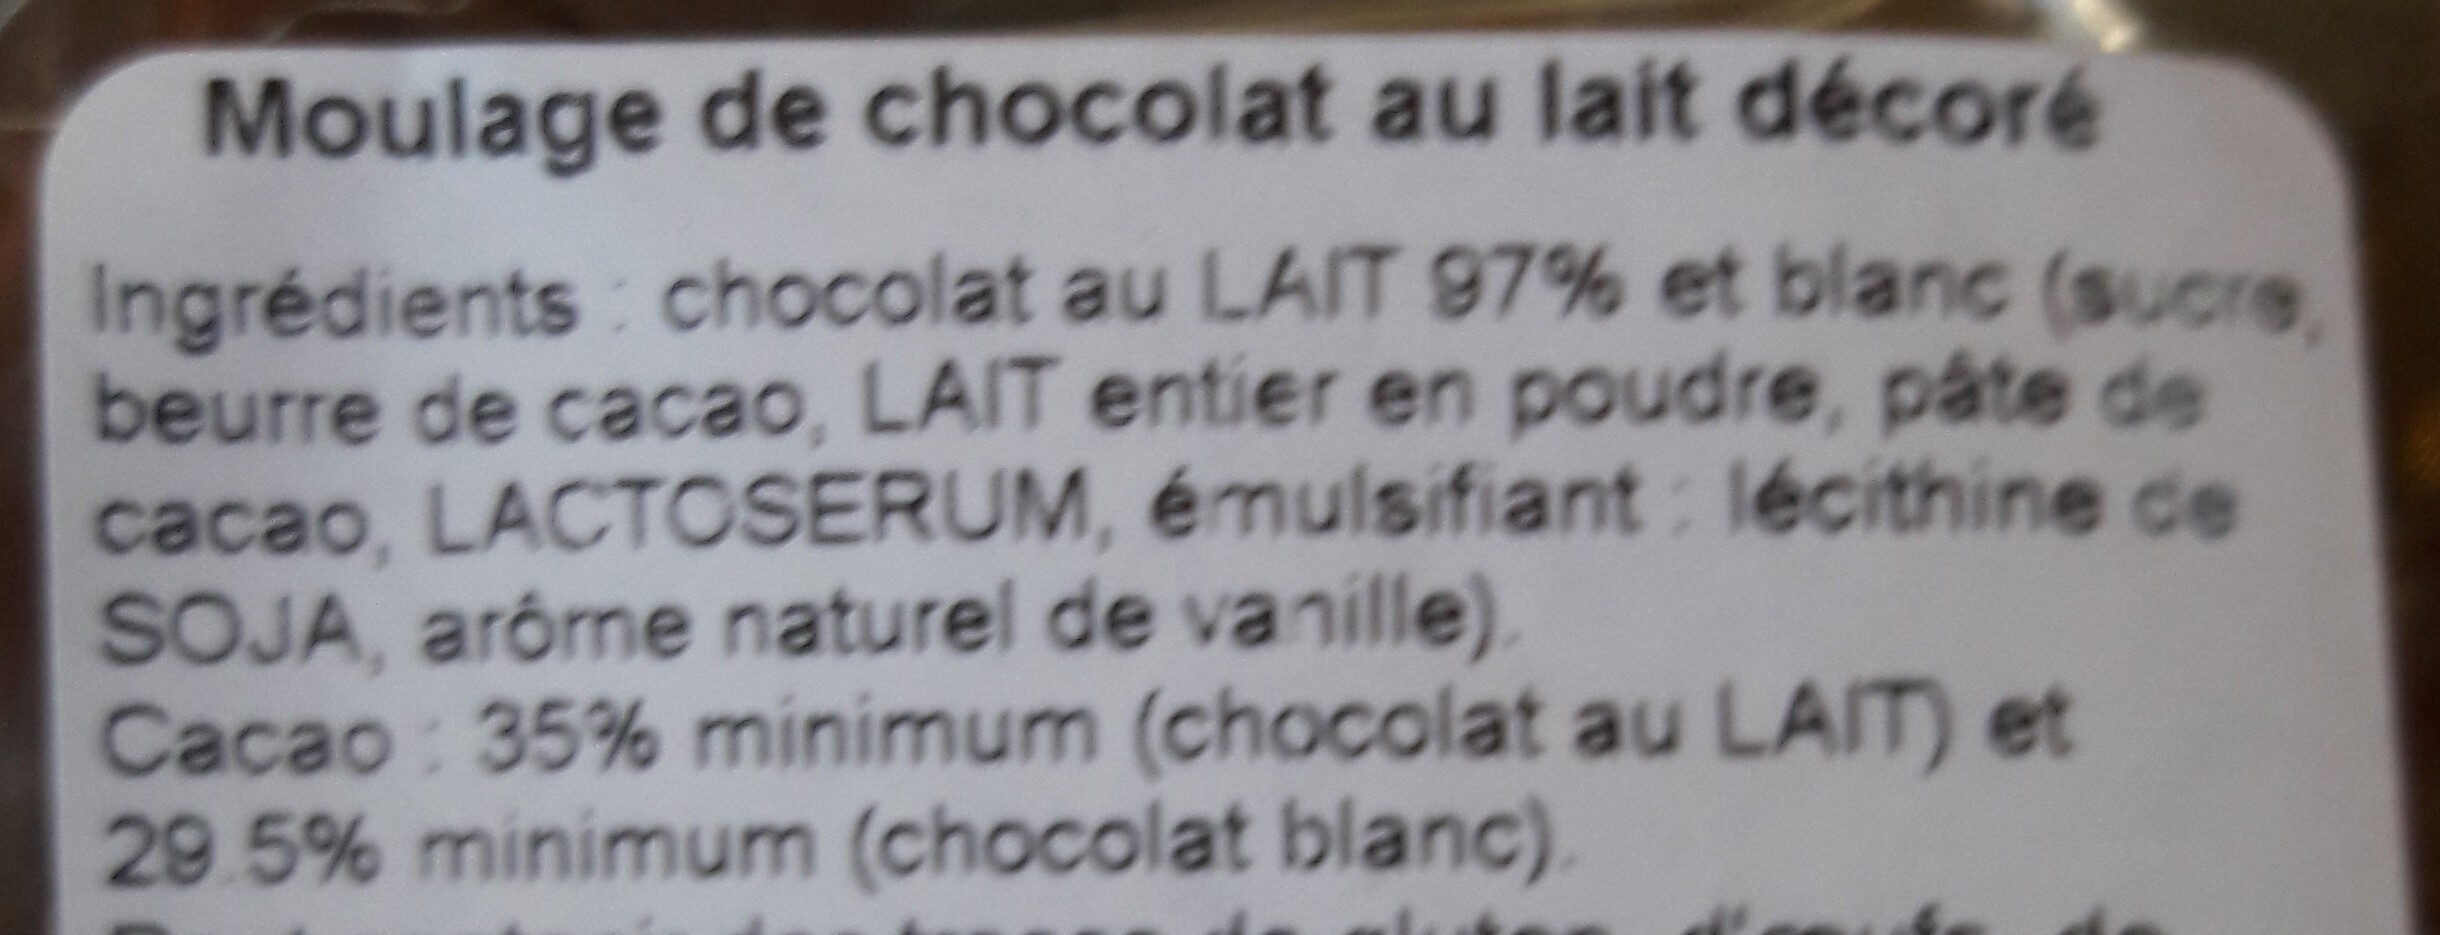 Poule au chocolat au lait - Ingrediënten - fr